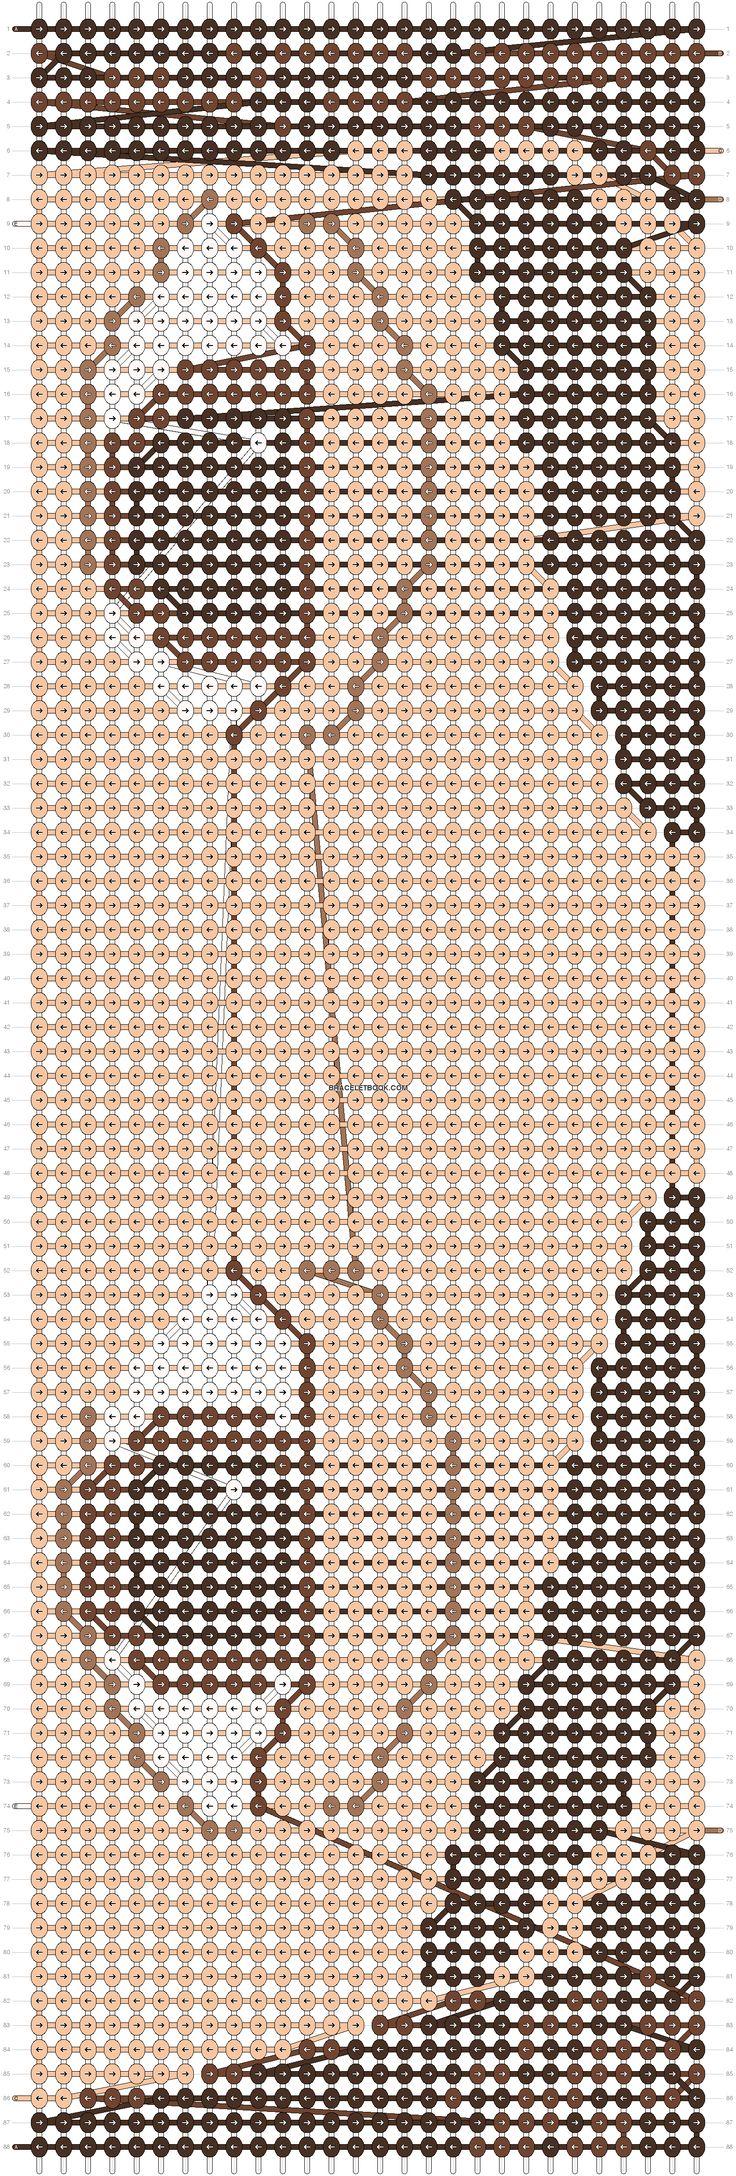 Alpha Pattern #11052 added by KotinKandy